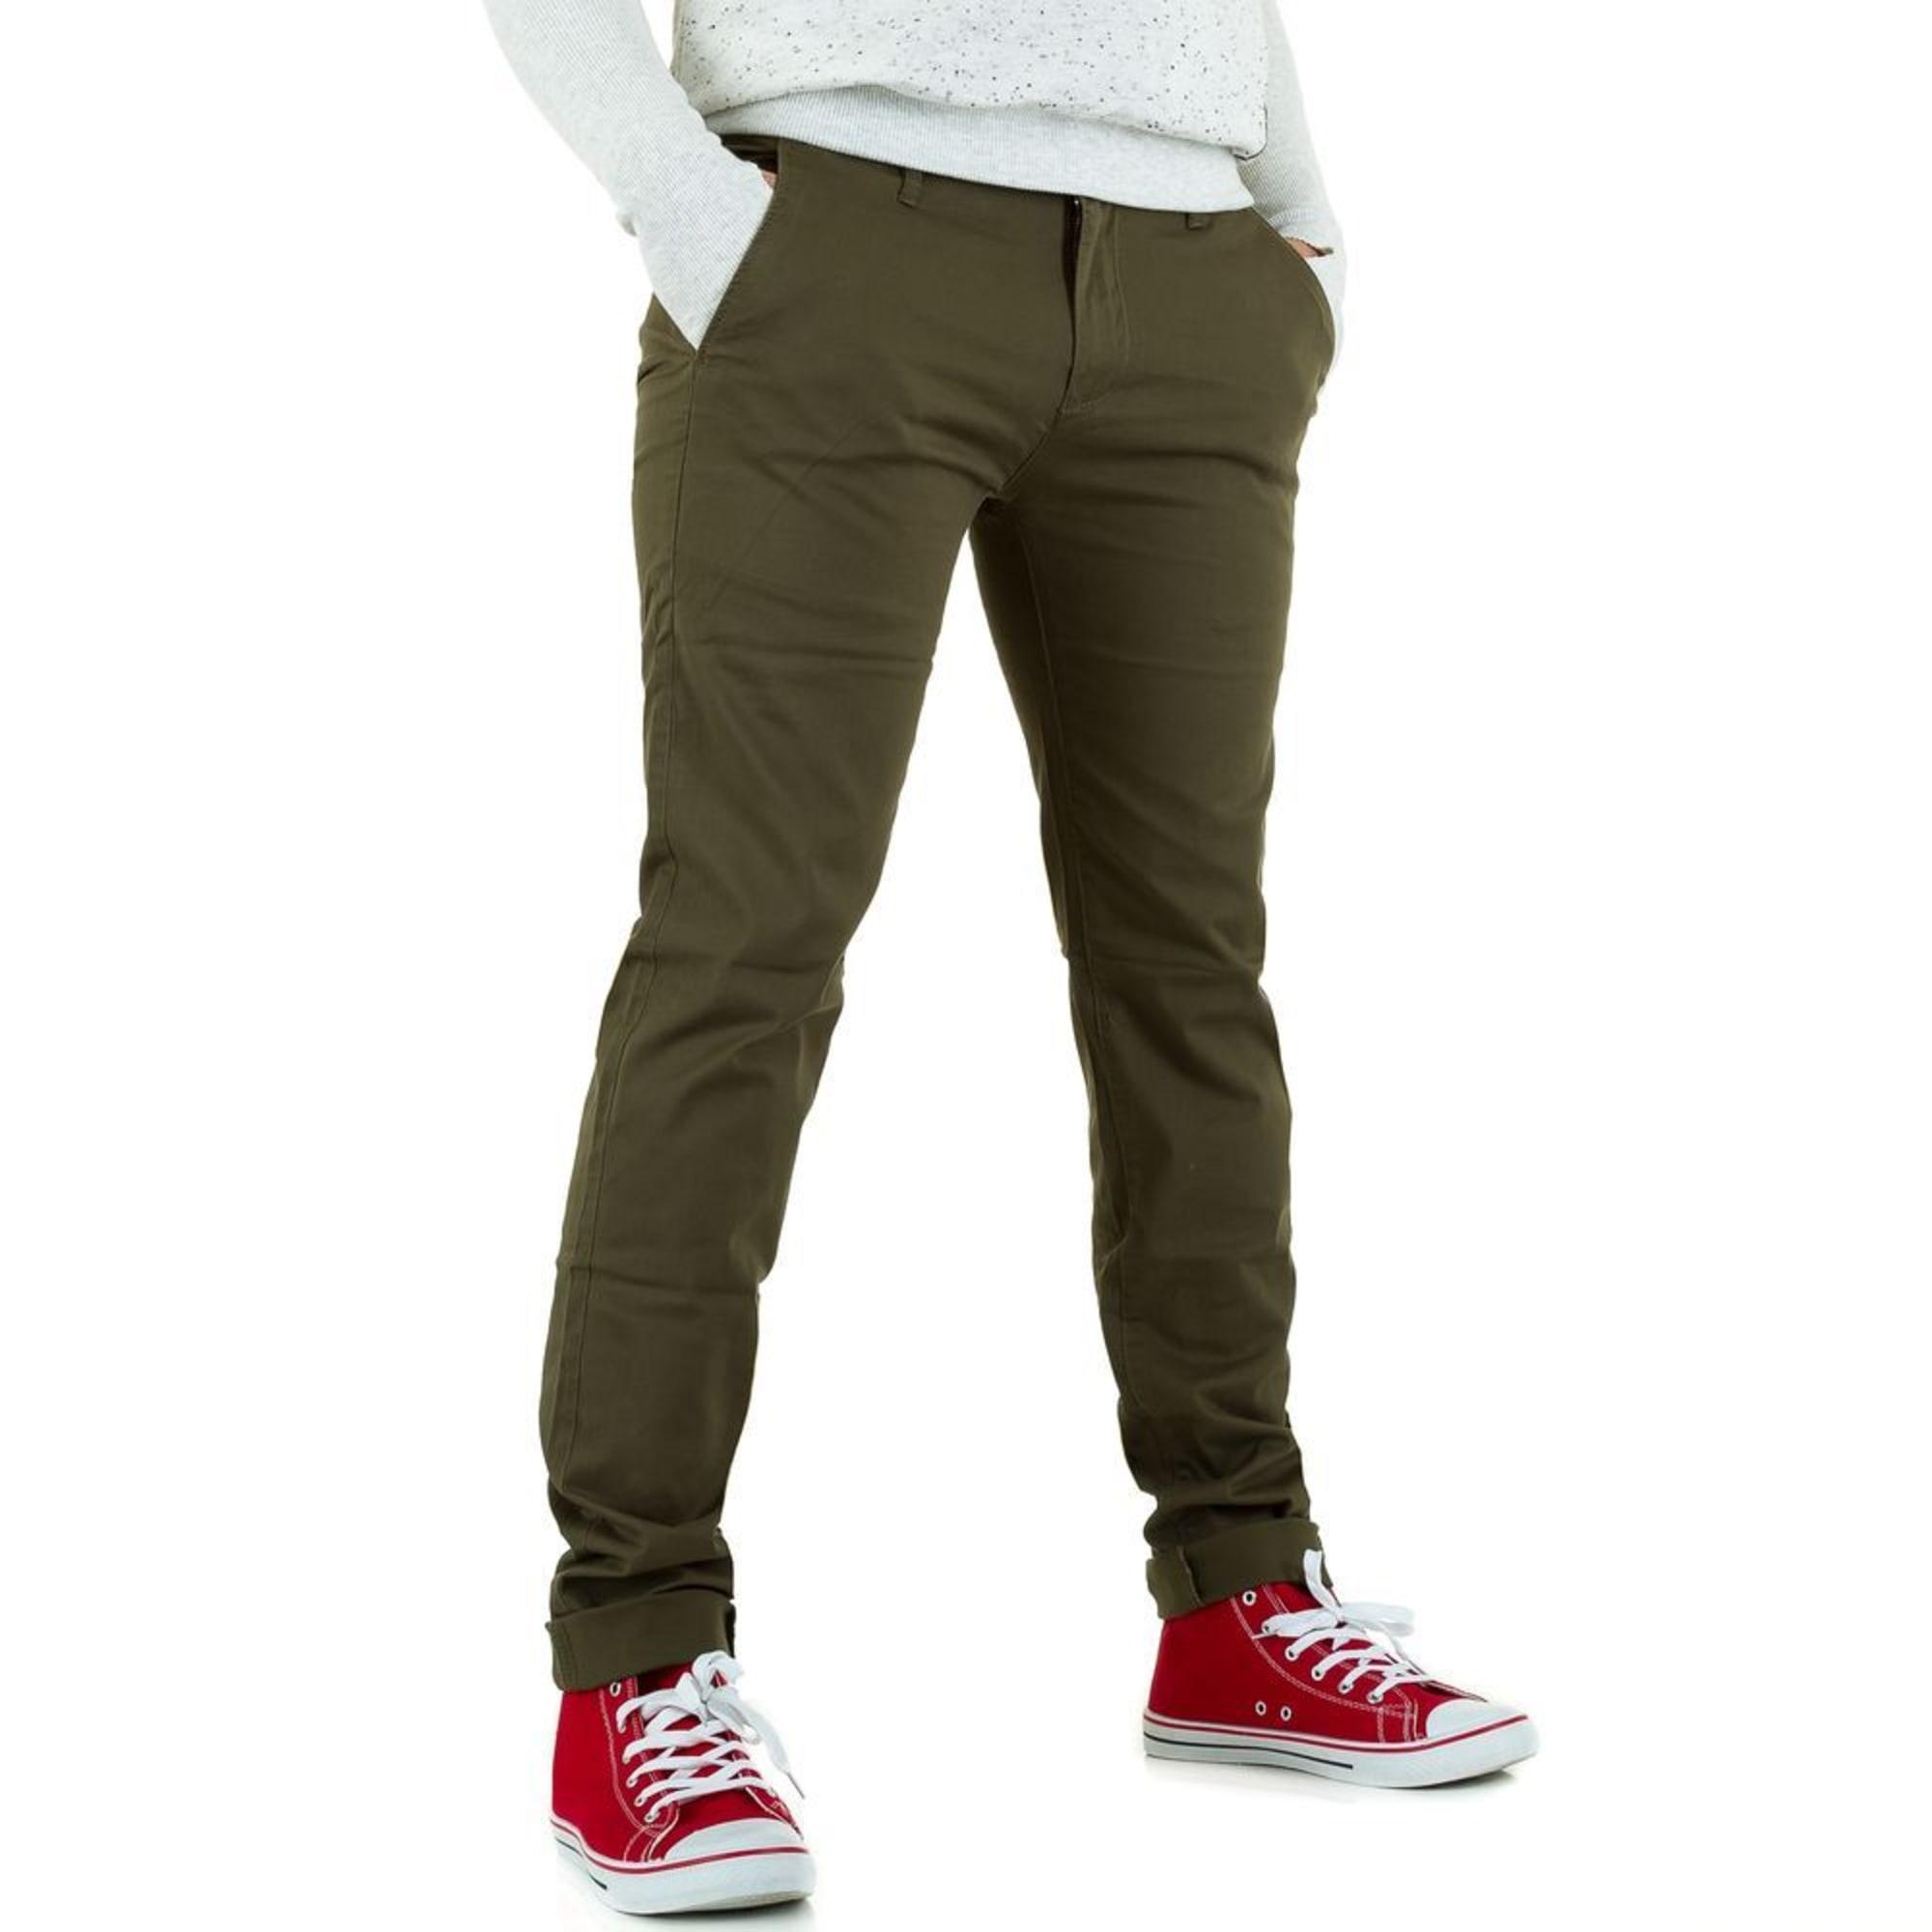 fdd8982de493b Pantalon slim BRUNO LEONI DENIM 44 (XL) kaki - 6872165